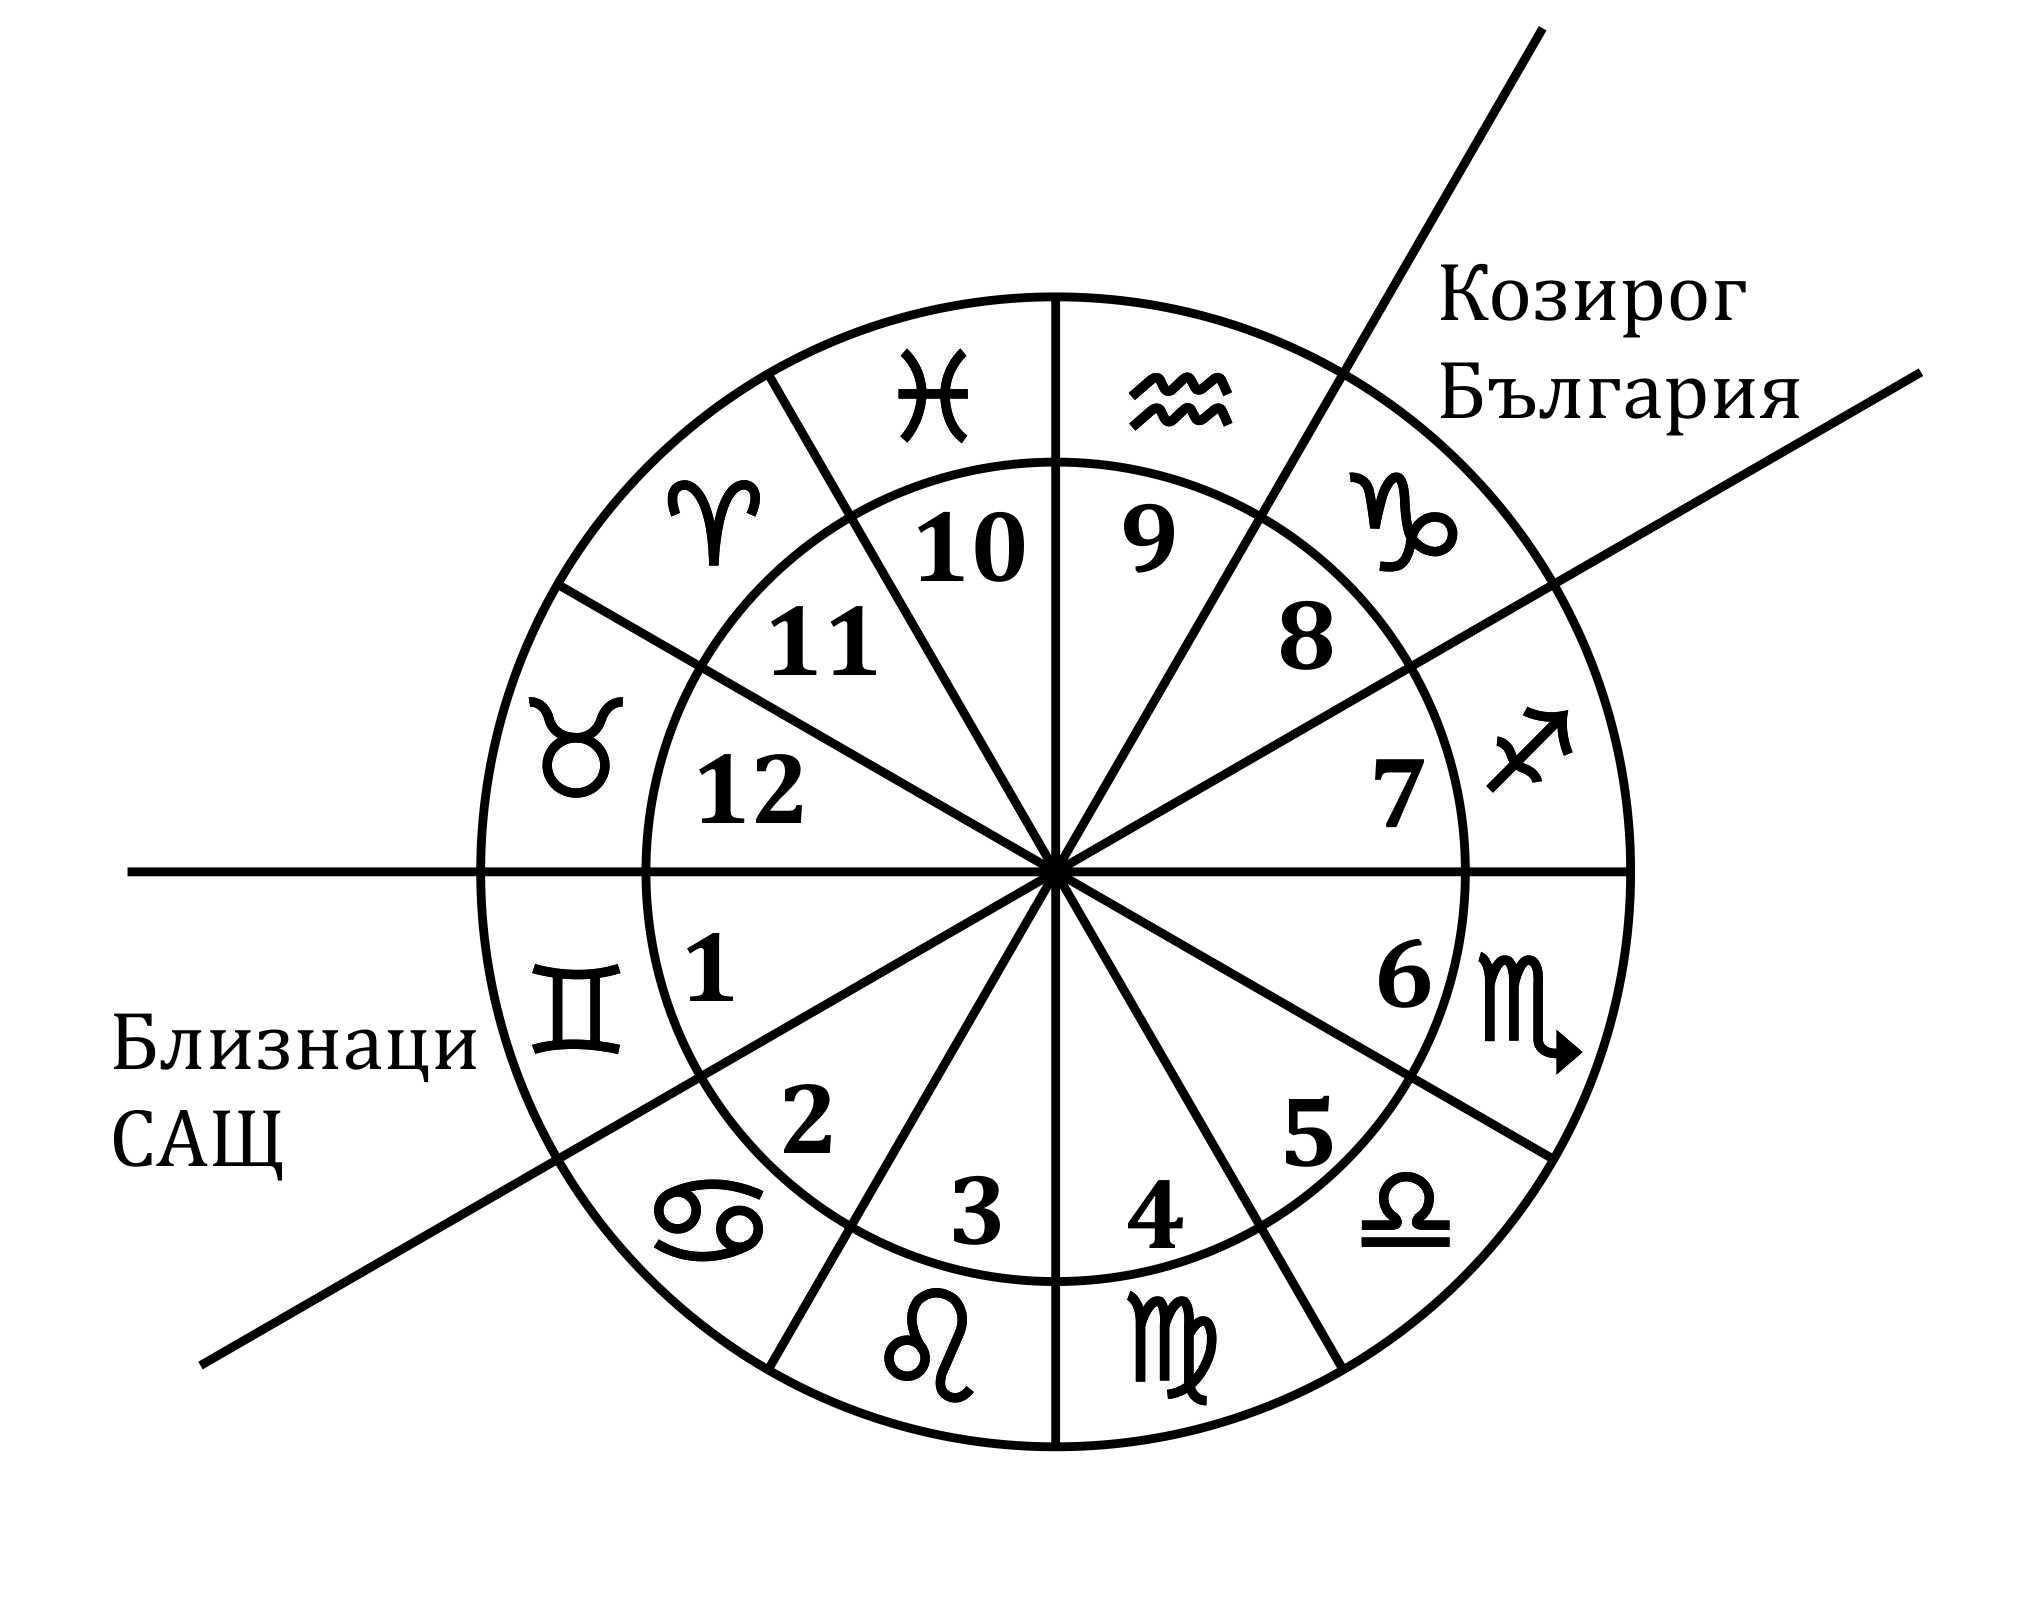 http://tayni.net/wp-content/uploads/2016/03/zodiac2.jpg